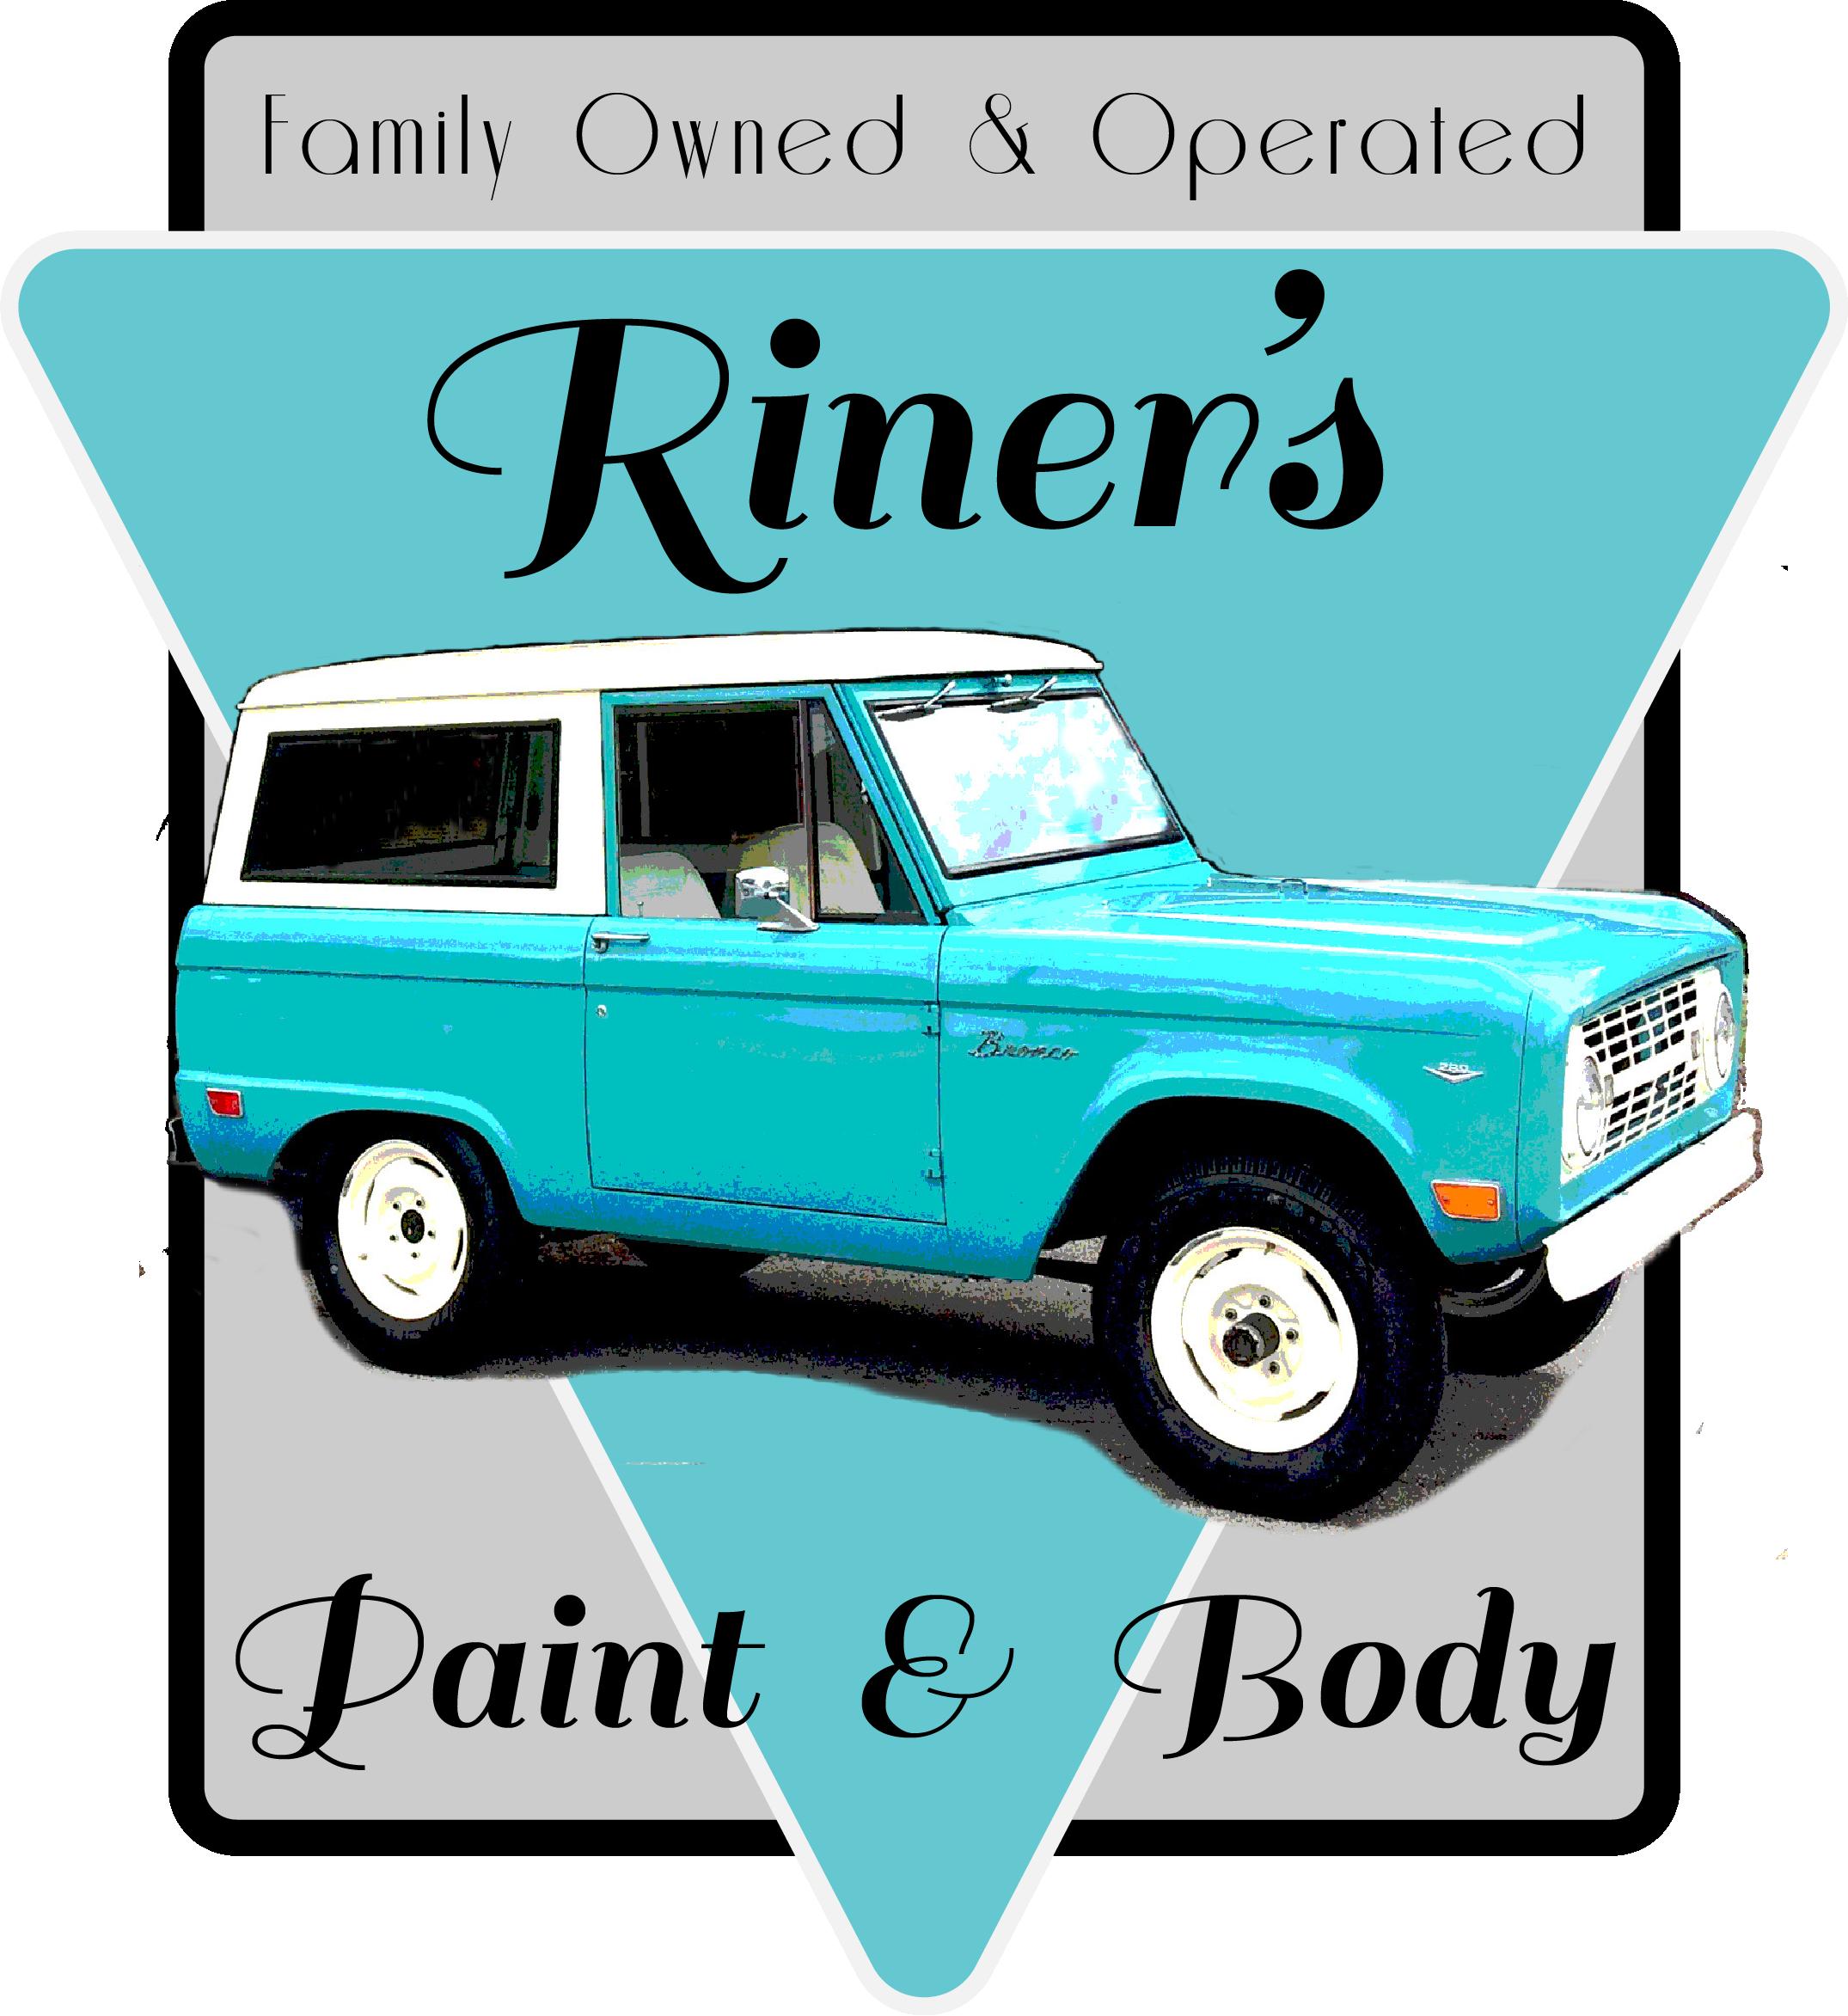 riner logo 2